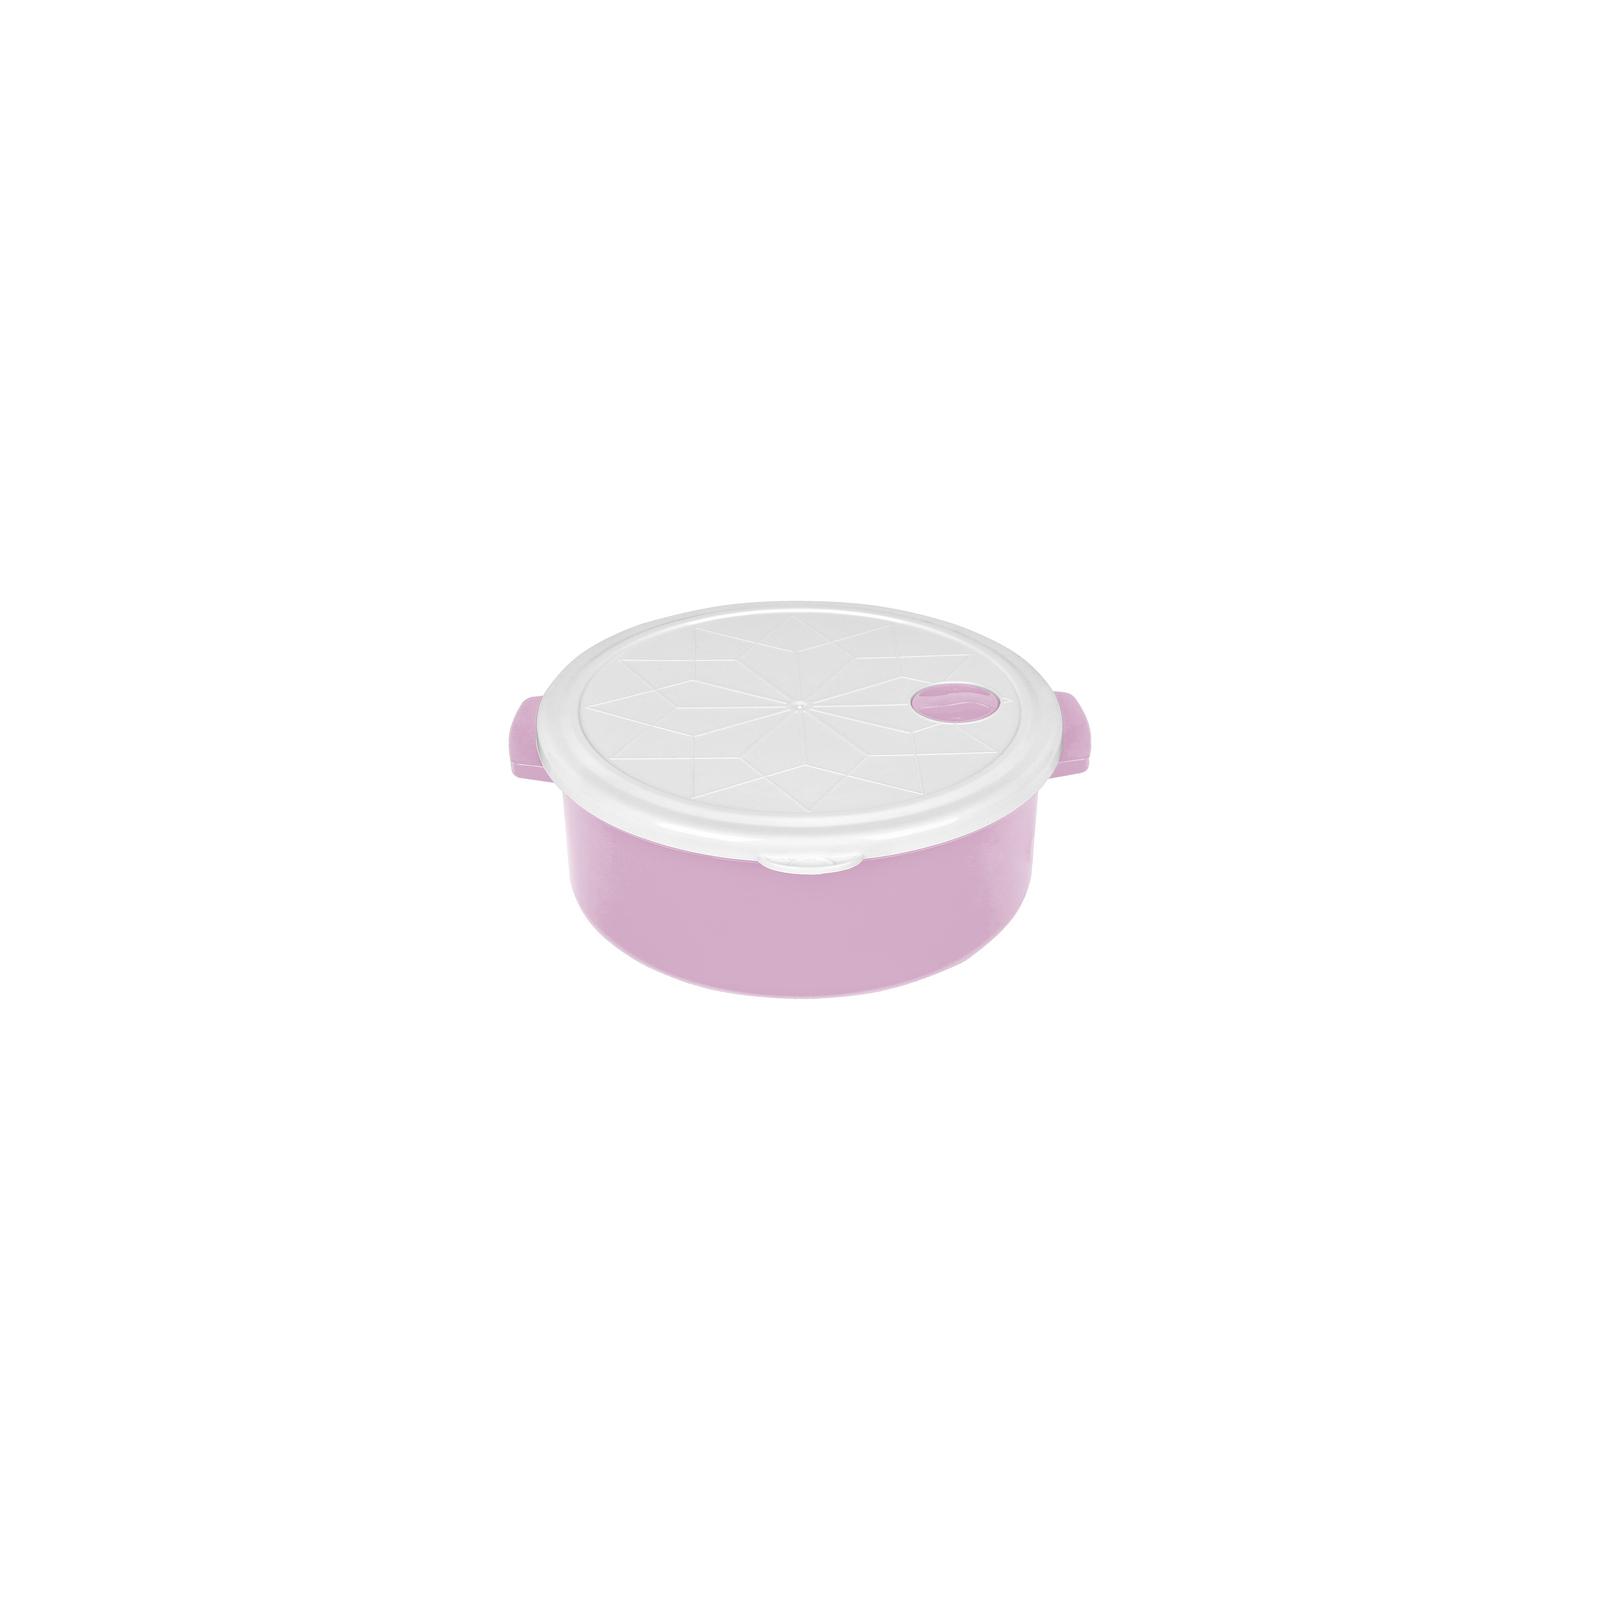 Пищевой контейнер Bager 2.7 л White/Lilac (BG-420 L)